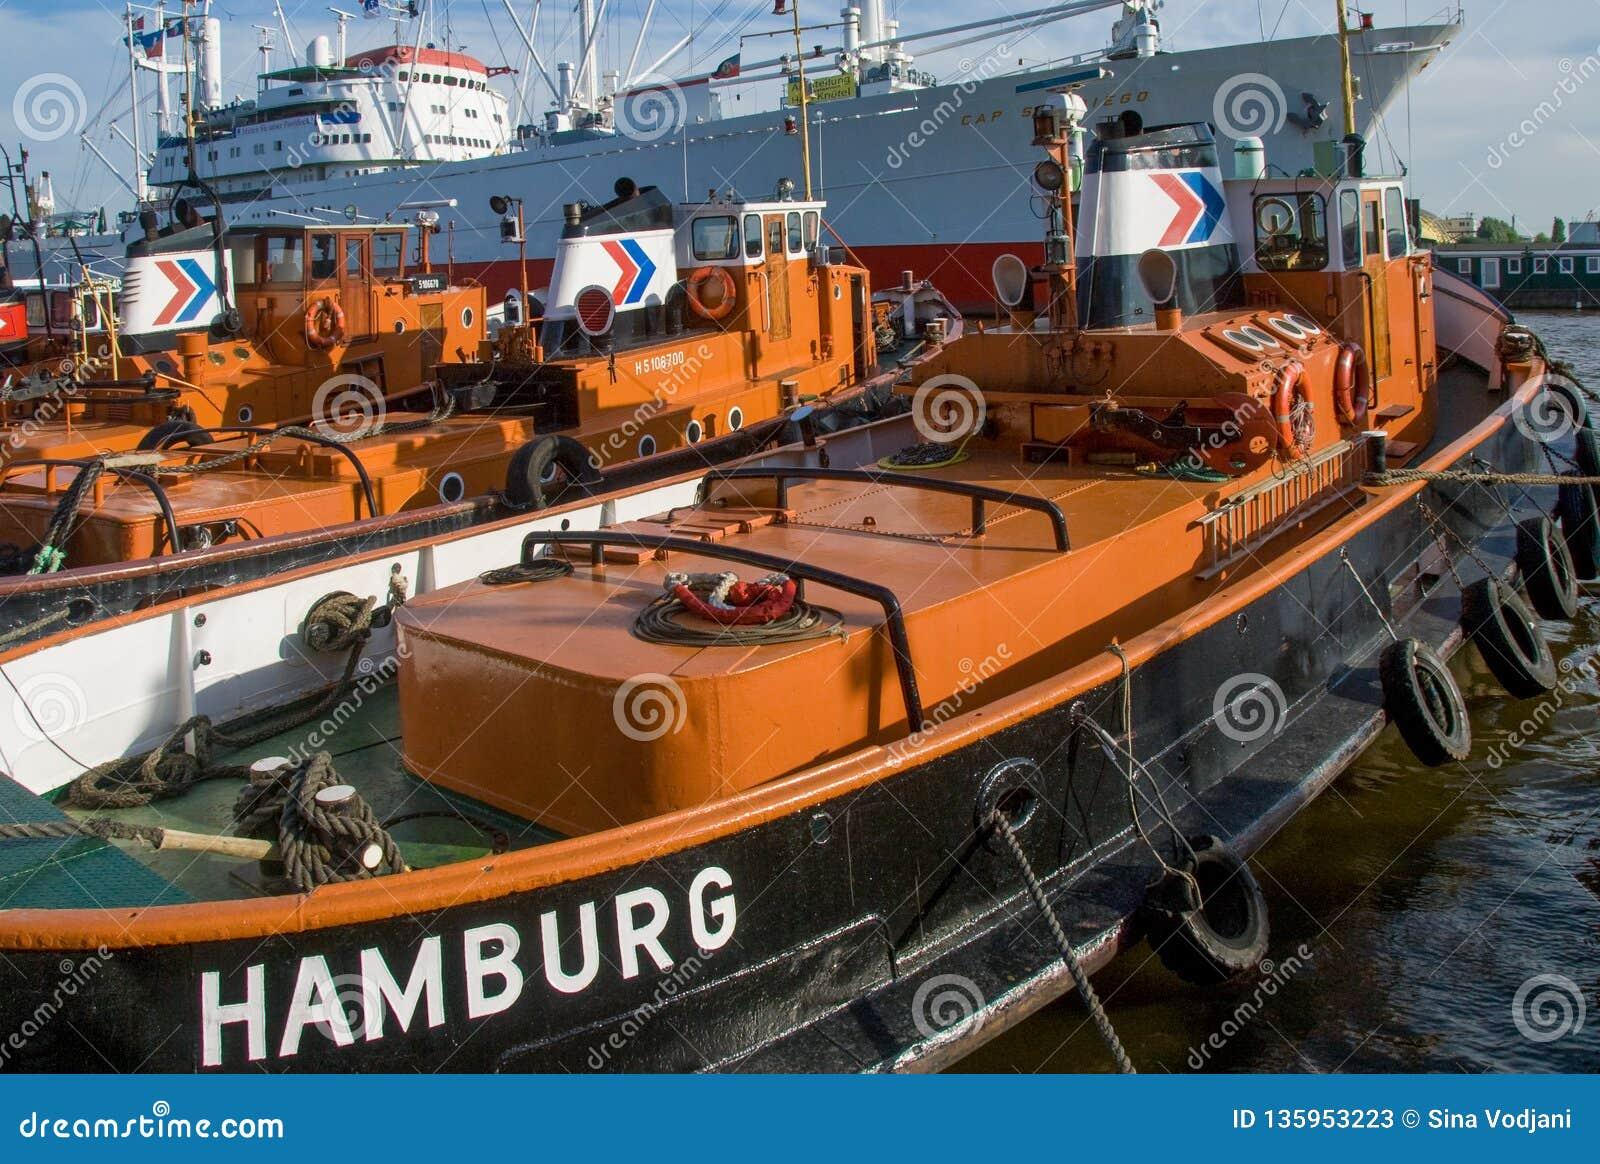 Schlepper tractor boat in Hamburg harbor